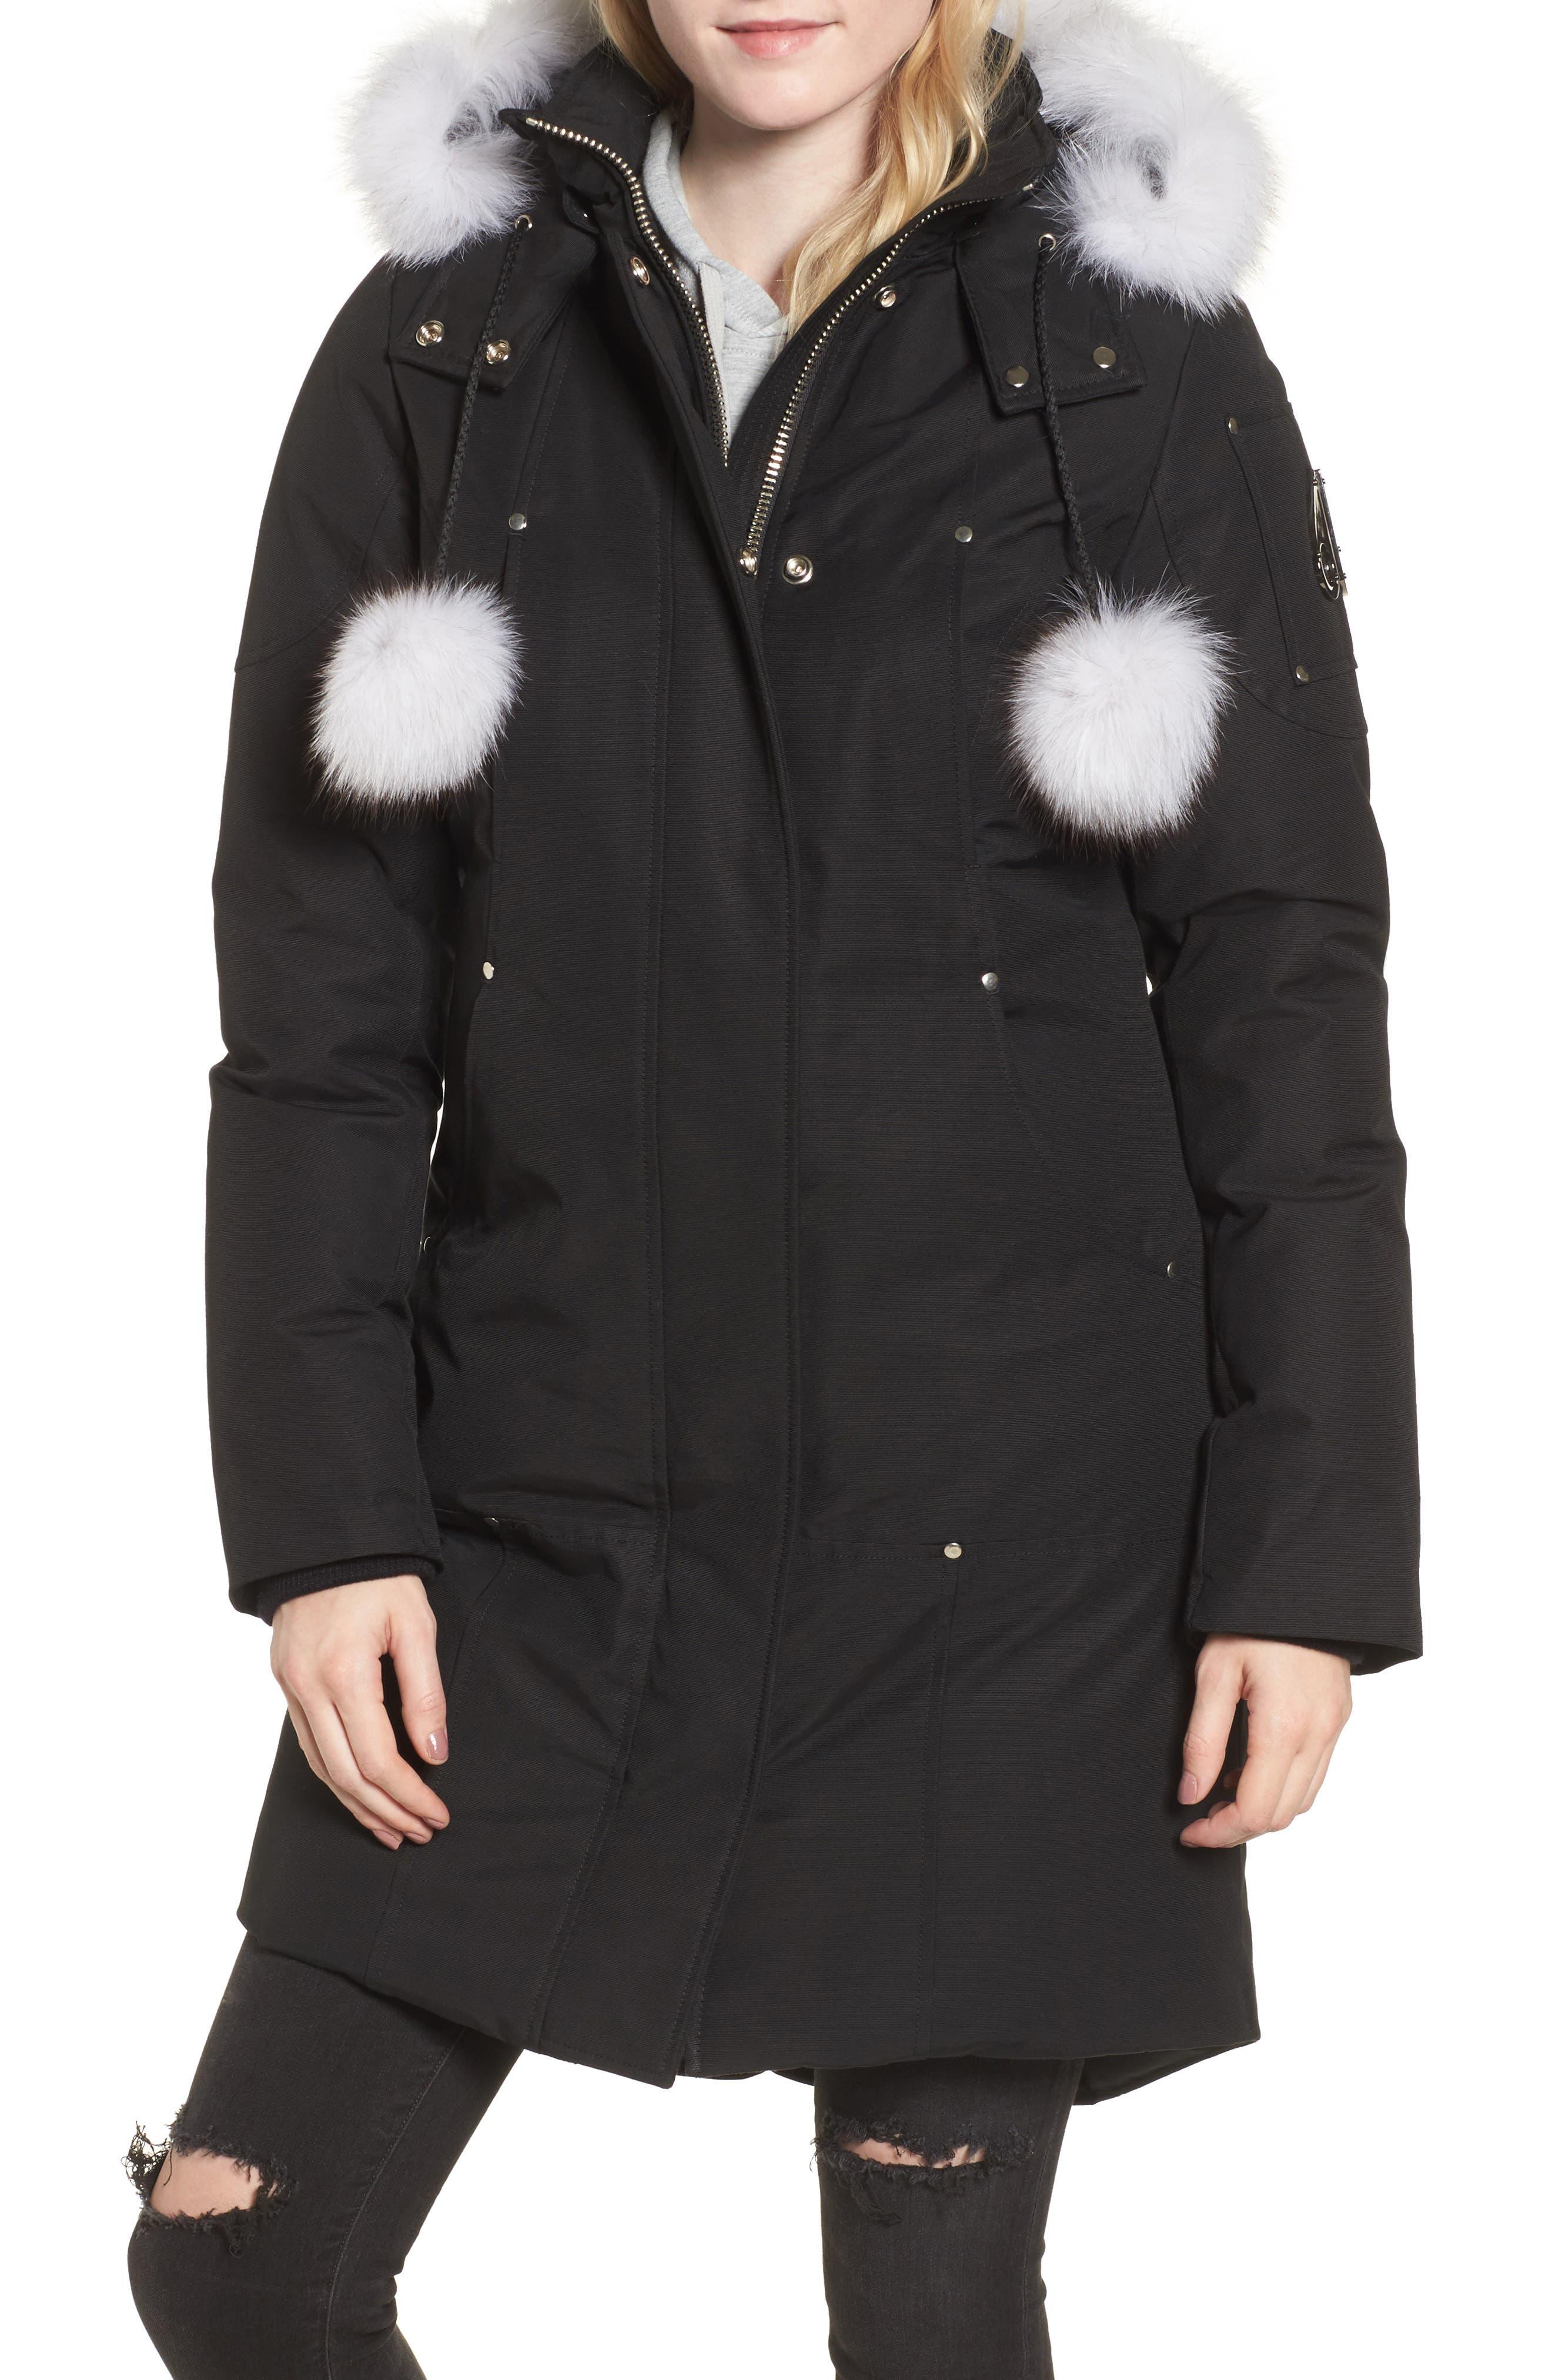 Alternate Image 1 Selected - Moose Knuckles 'Stirling' Down Parka with Genuine Fox Fur Trim